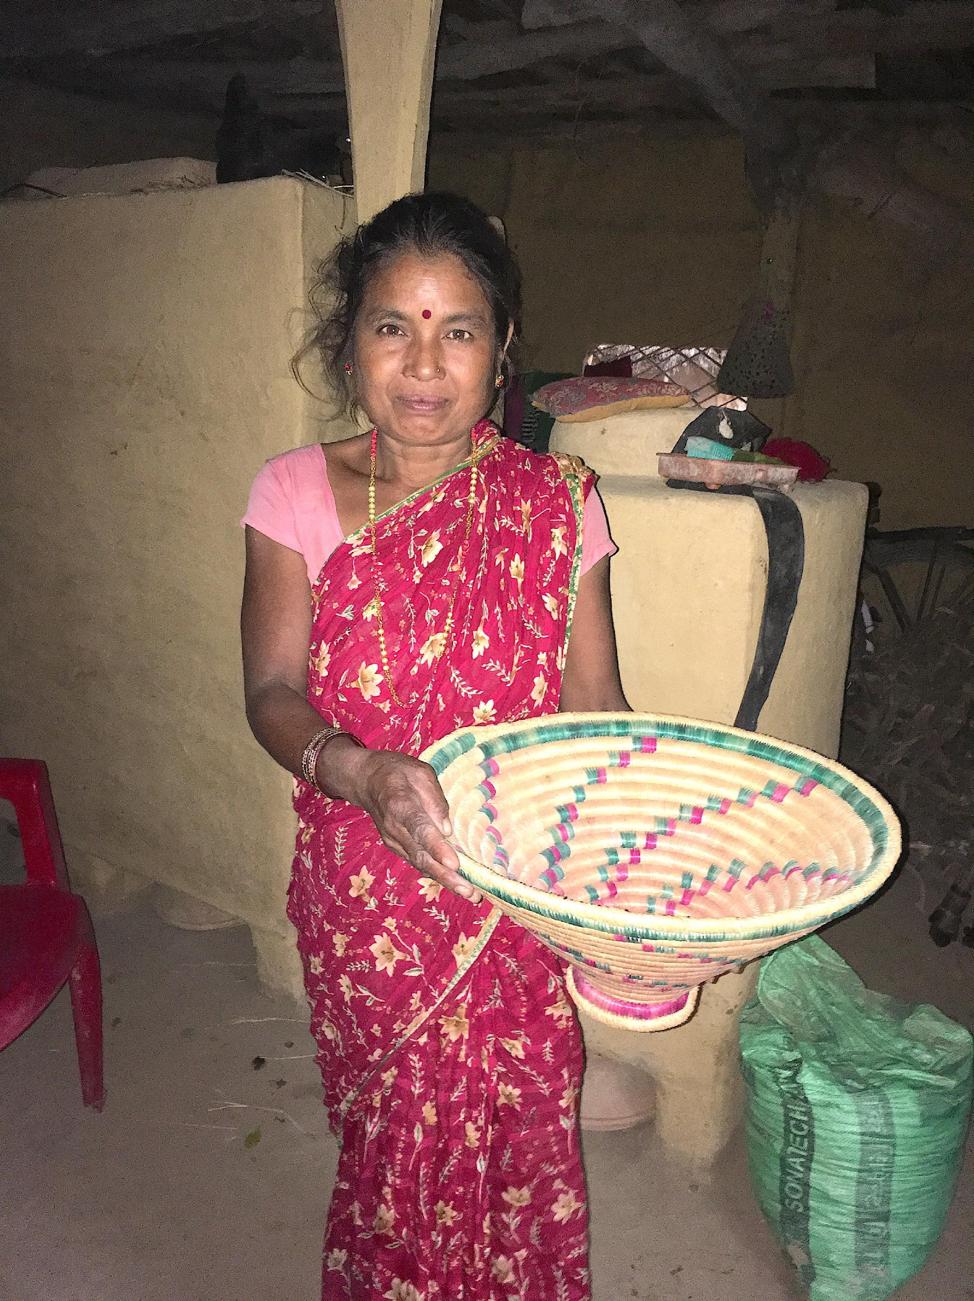 Dhankumari with her hand woven basket